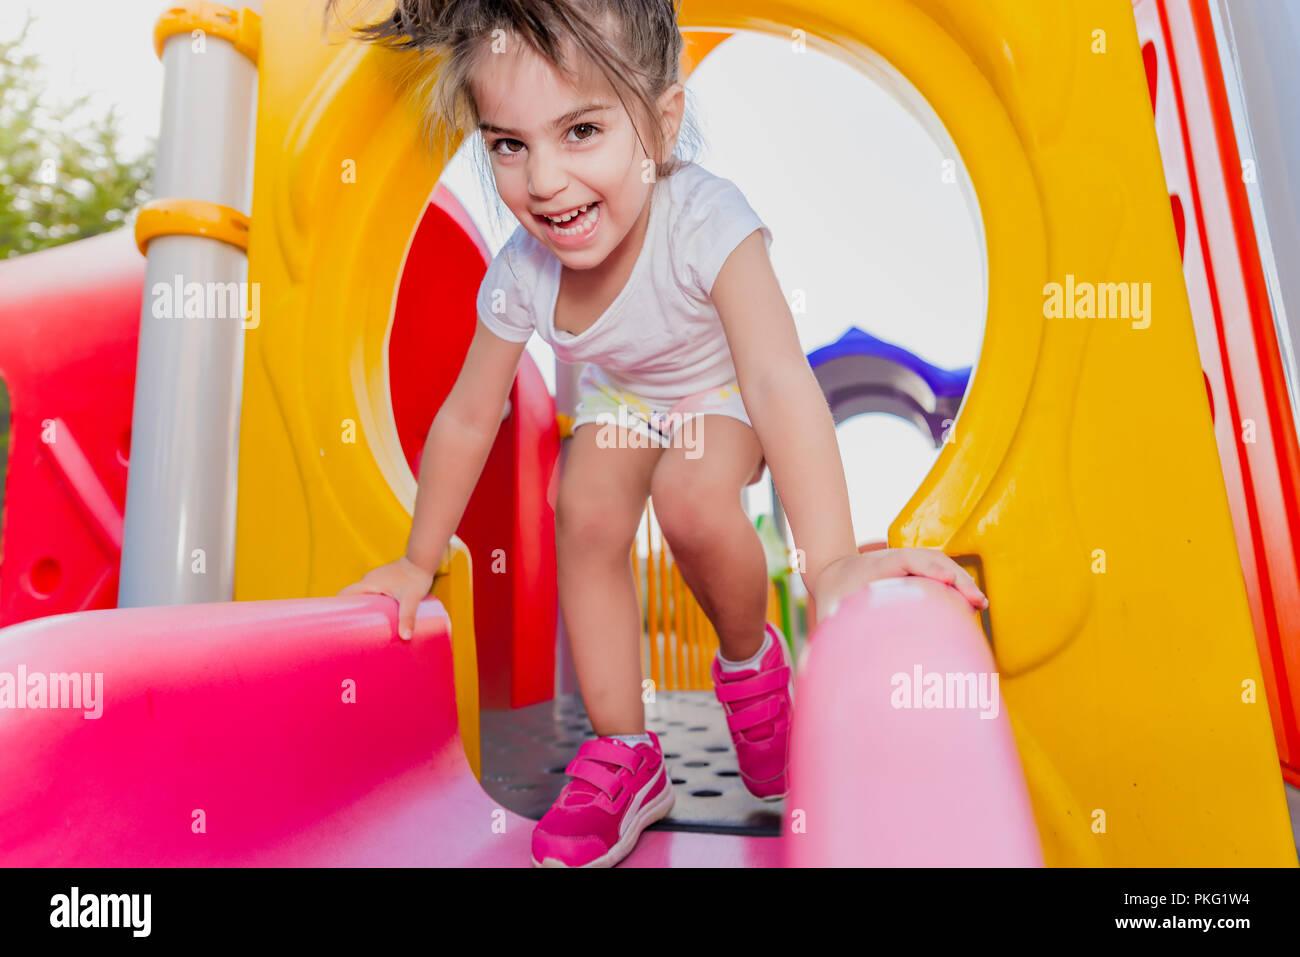 Retrato de cute little girl holding y deslizándose sobre deslizadores de playground Imagen De Stock